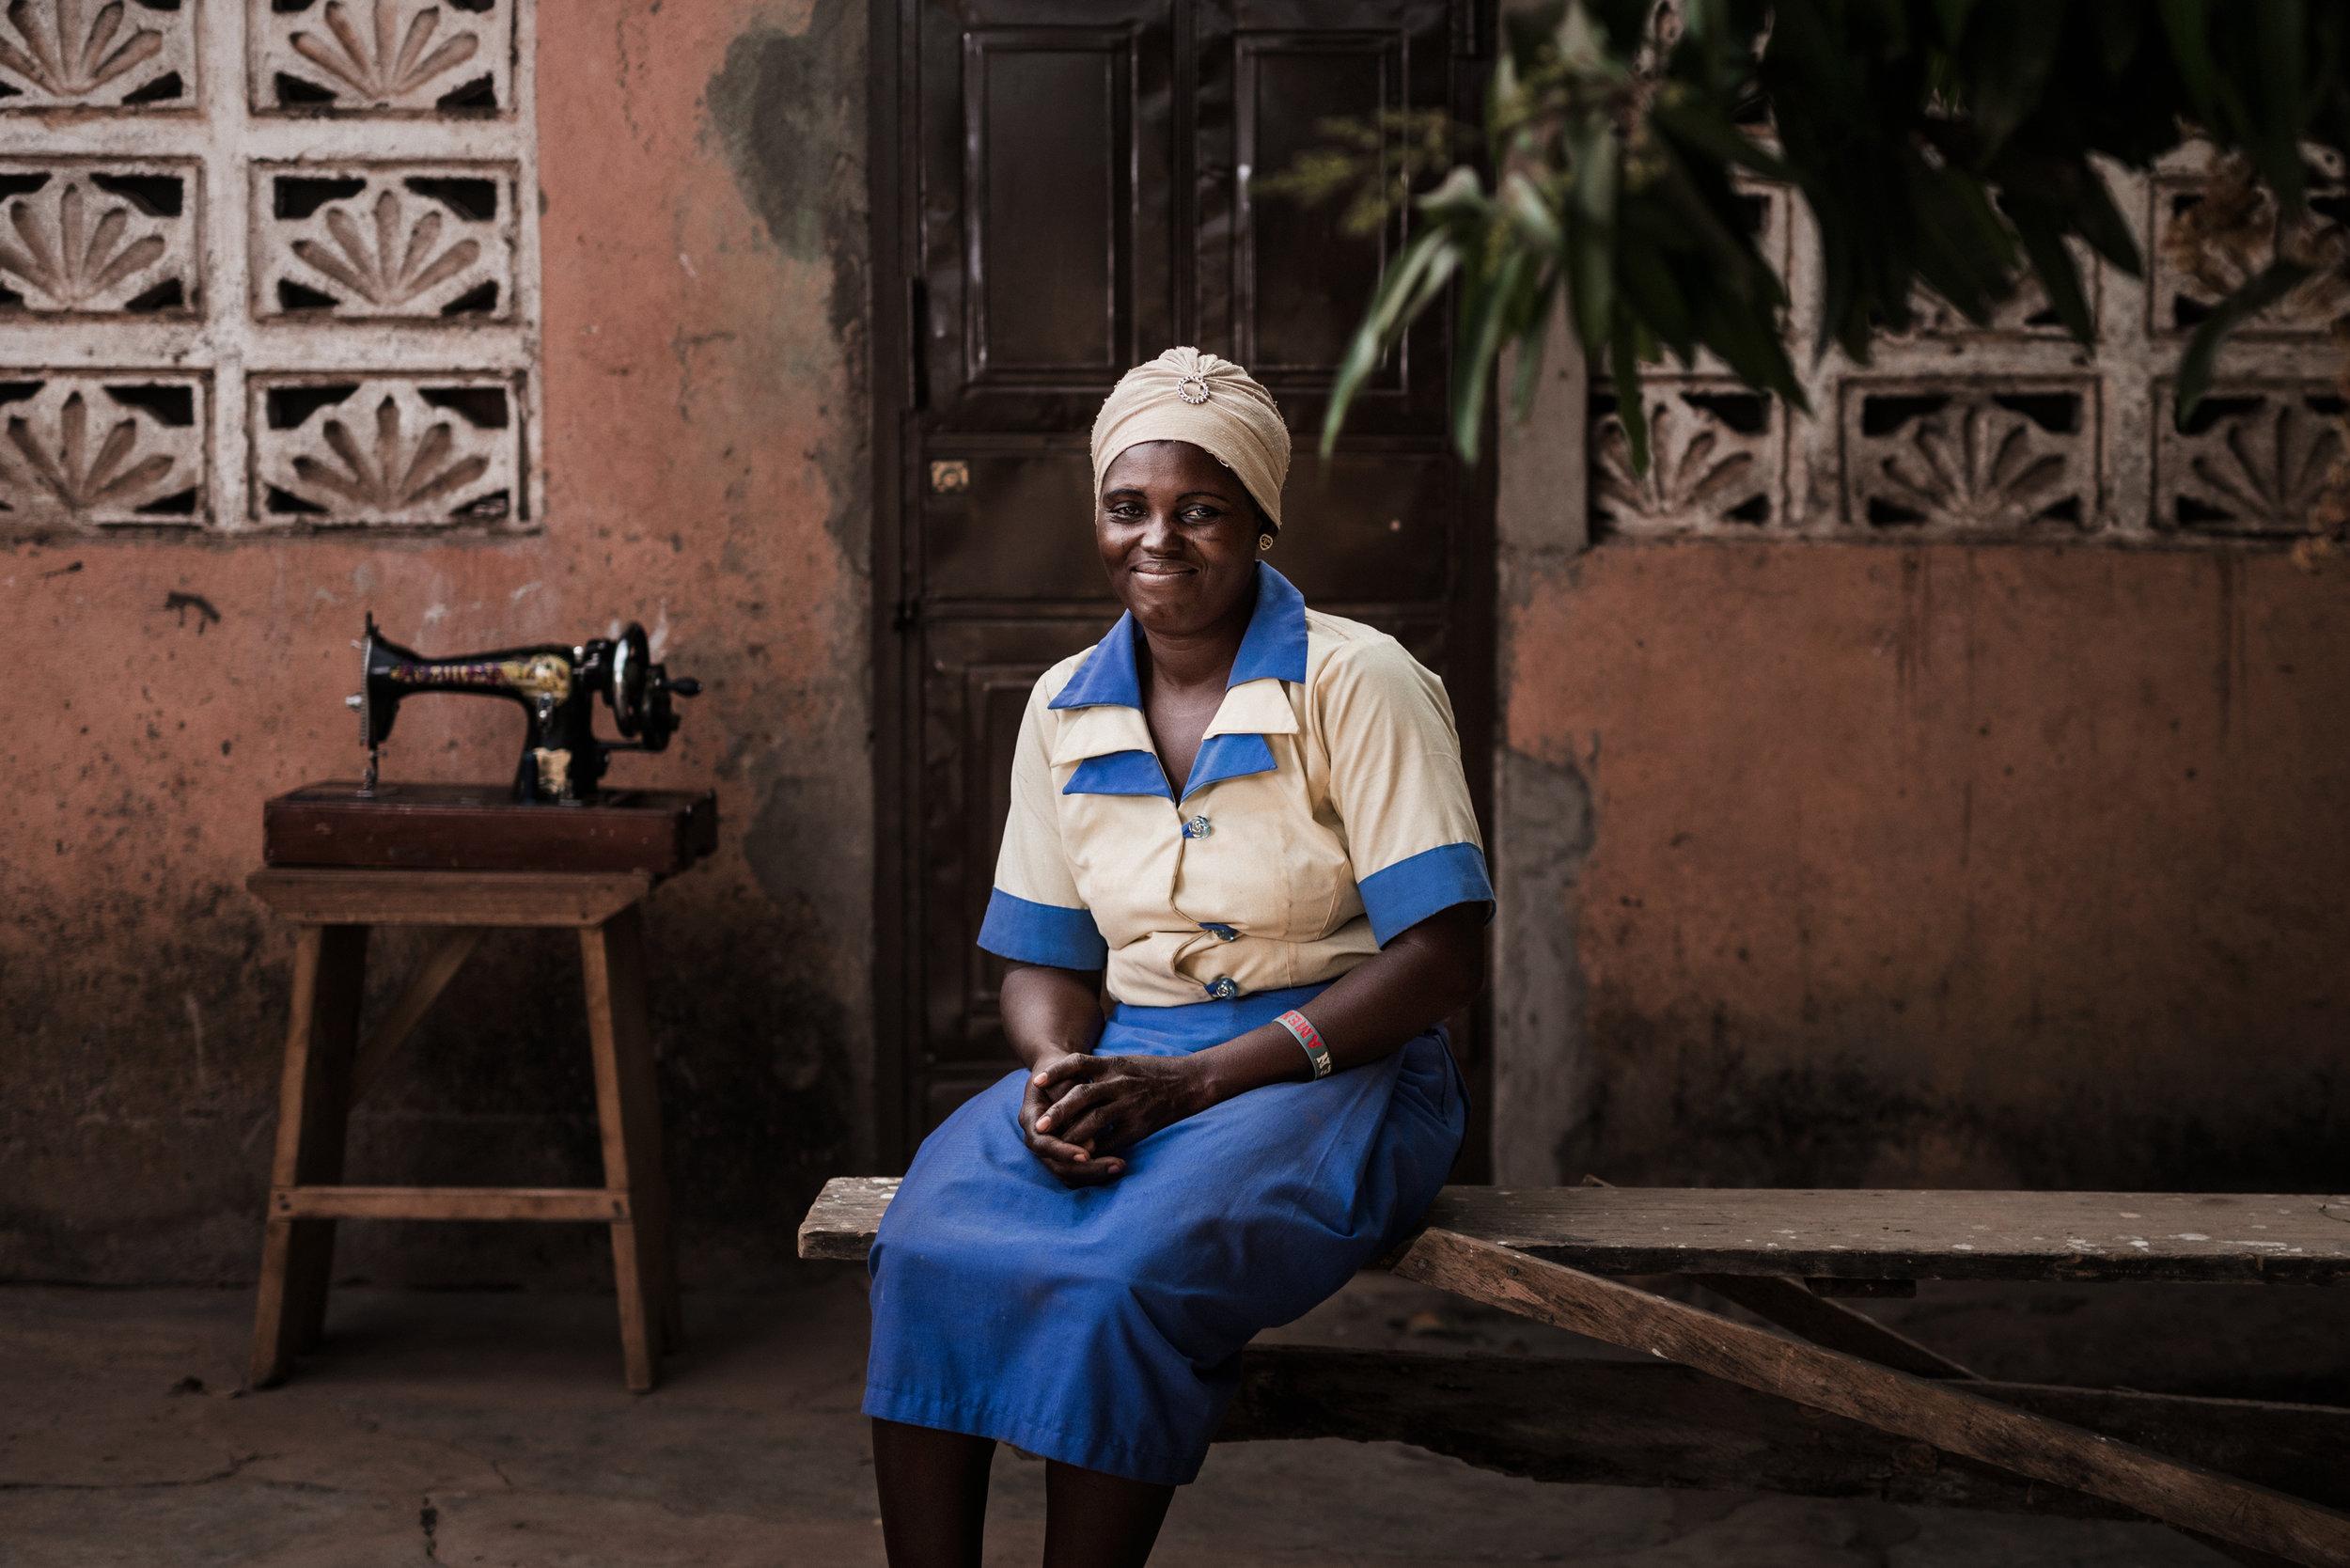 TaraShupe_HumanitarianPhotographer_Woman_Photographer_National_Geographic_Ghana_Women_064.jpg